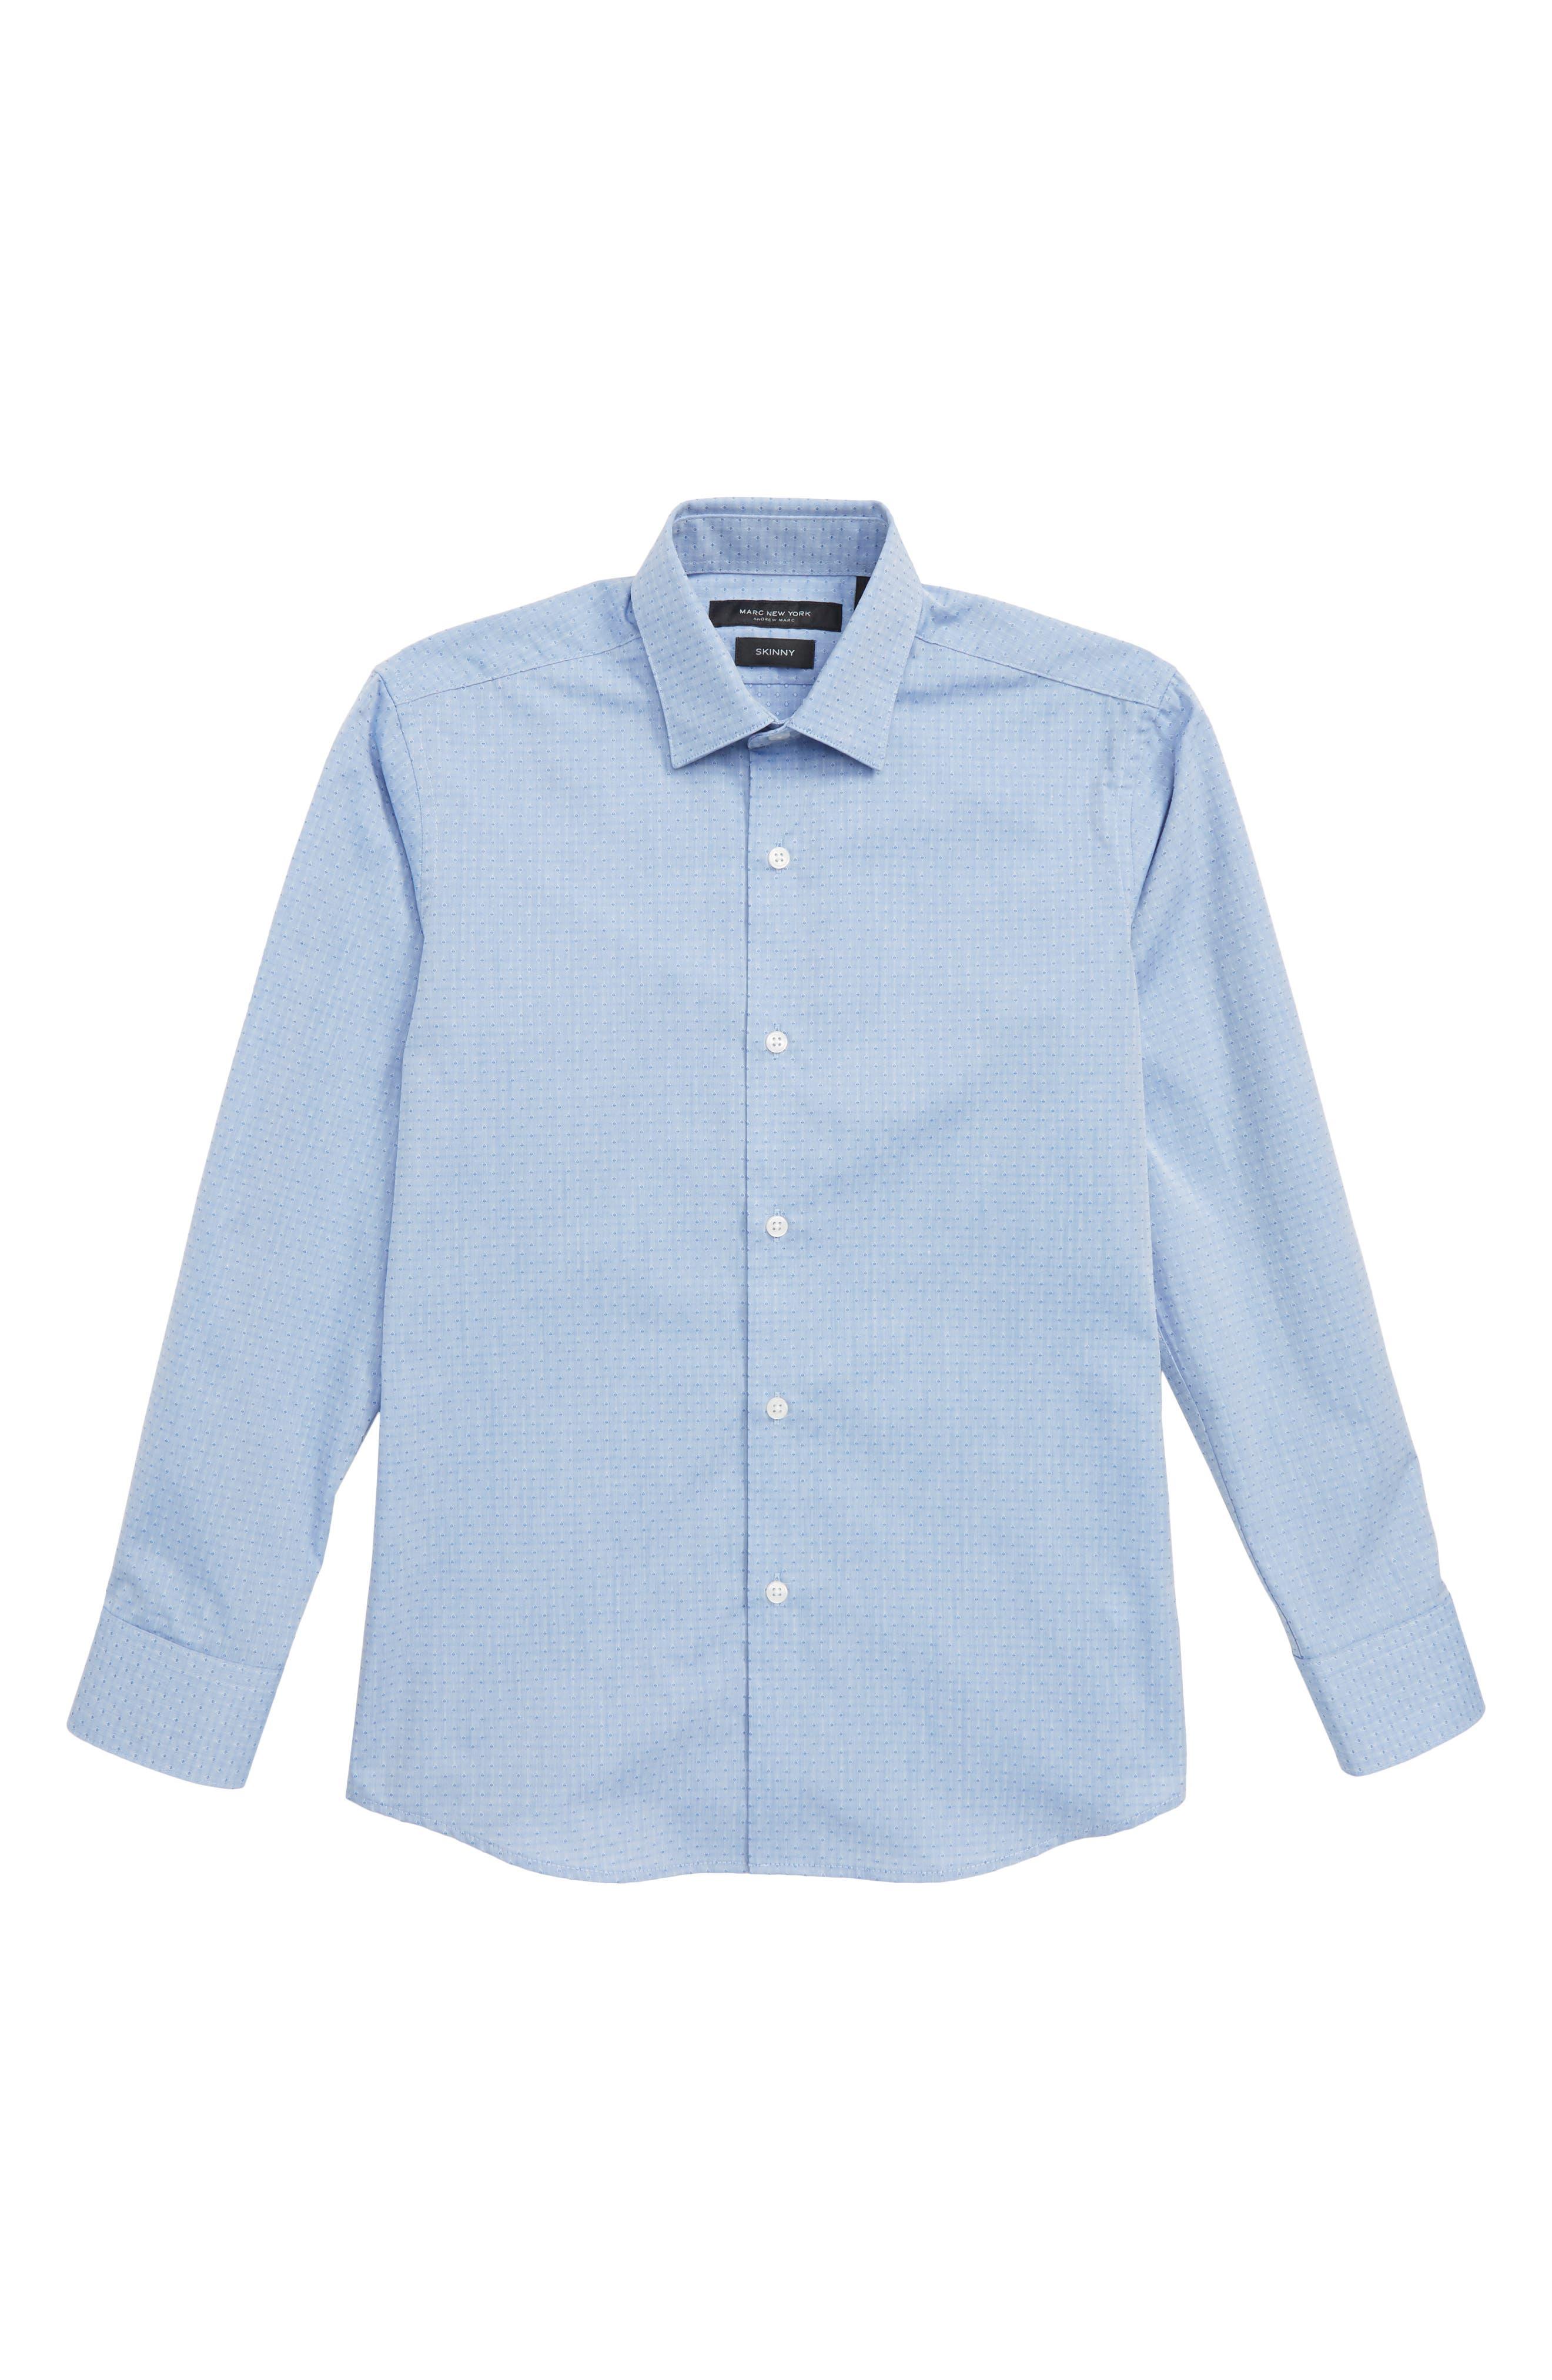 Diamond Print Skinny Fit Dress Shirt,                             Main thumbnail 1, color,                             400